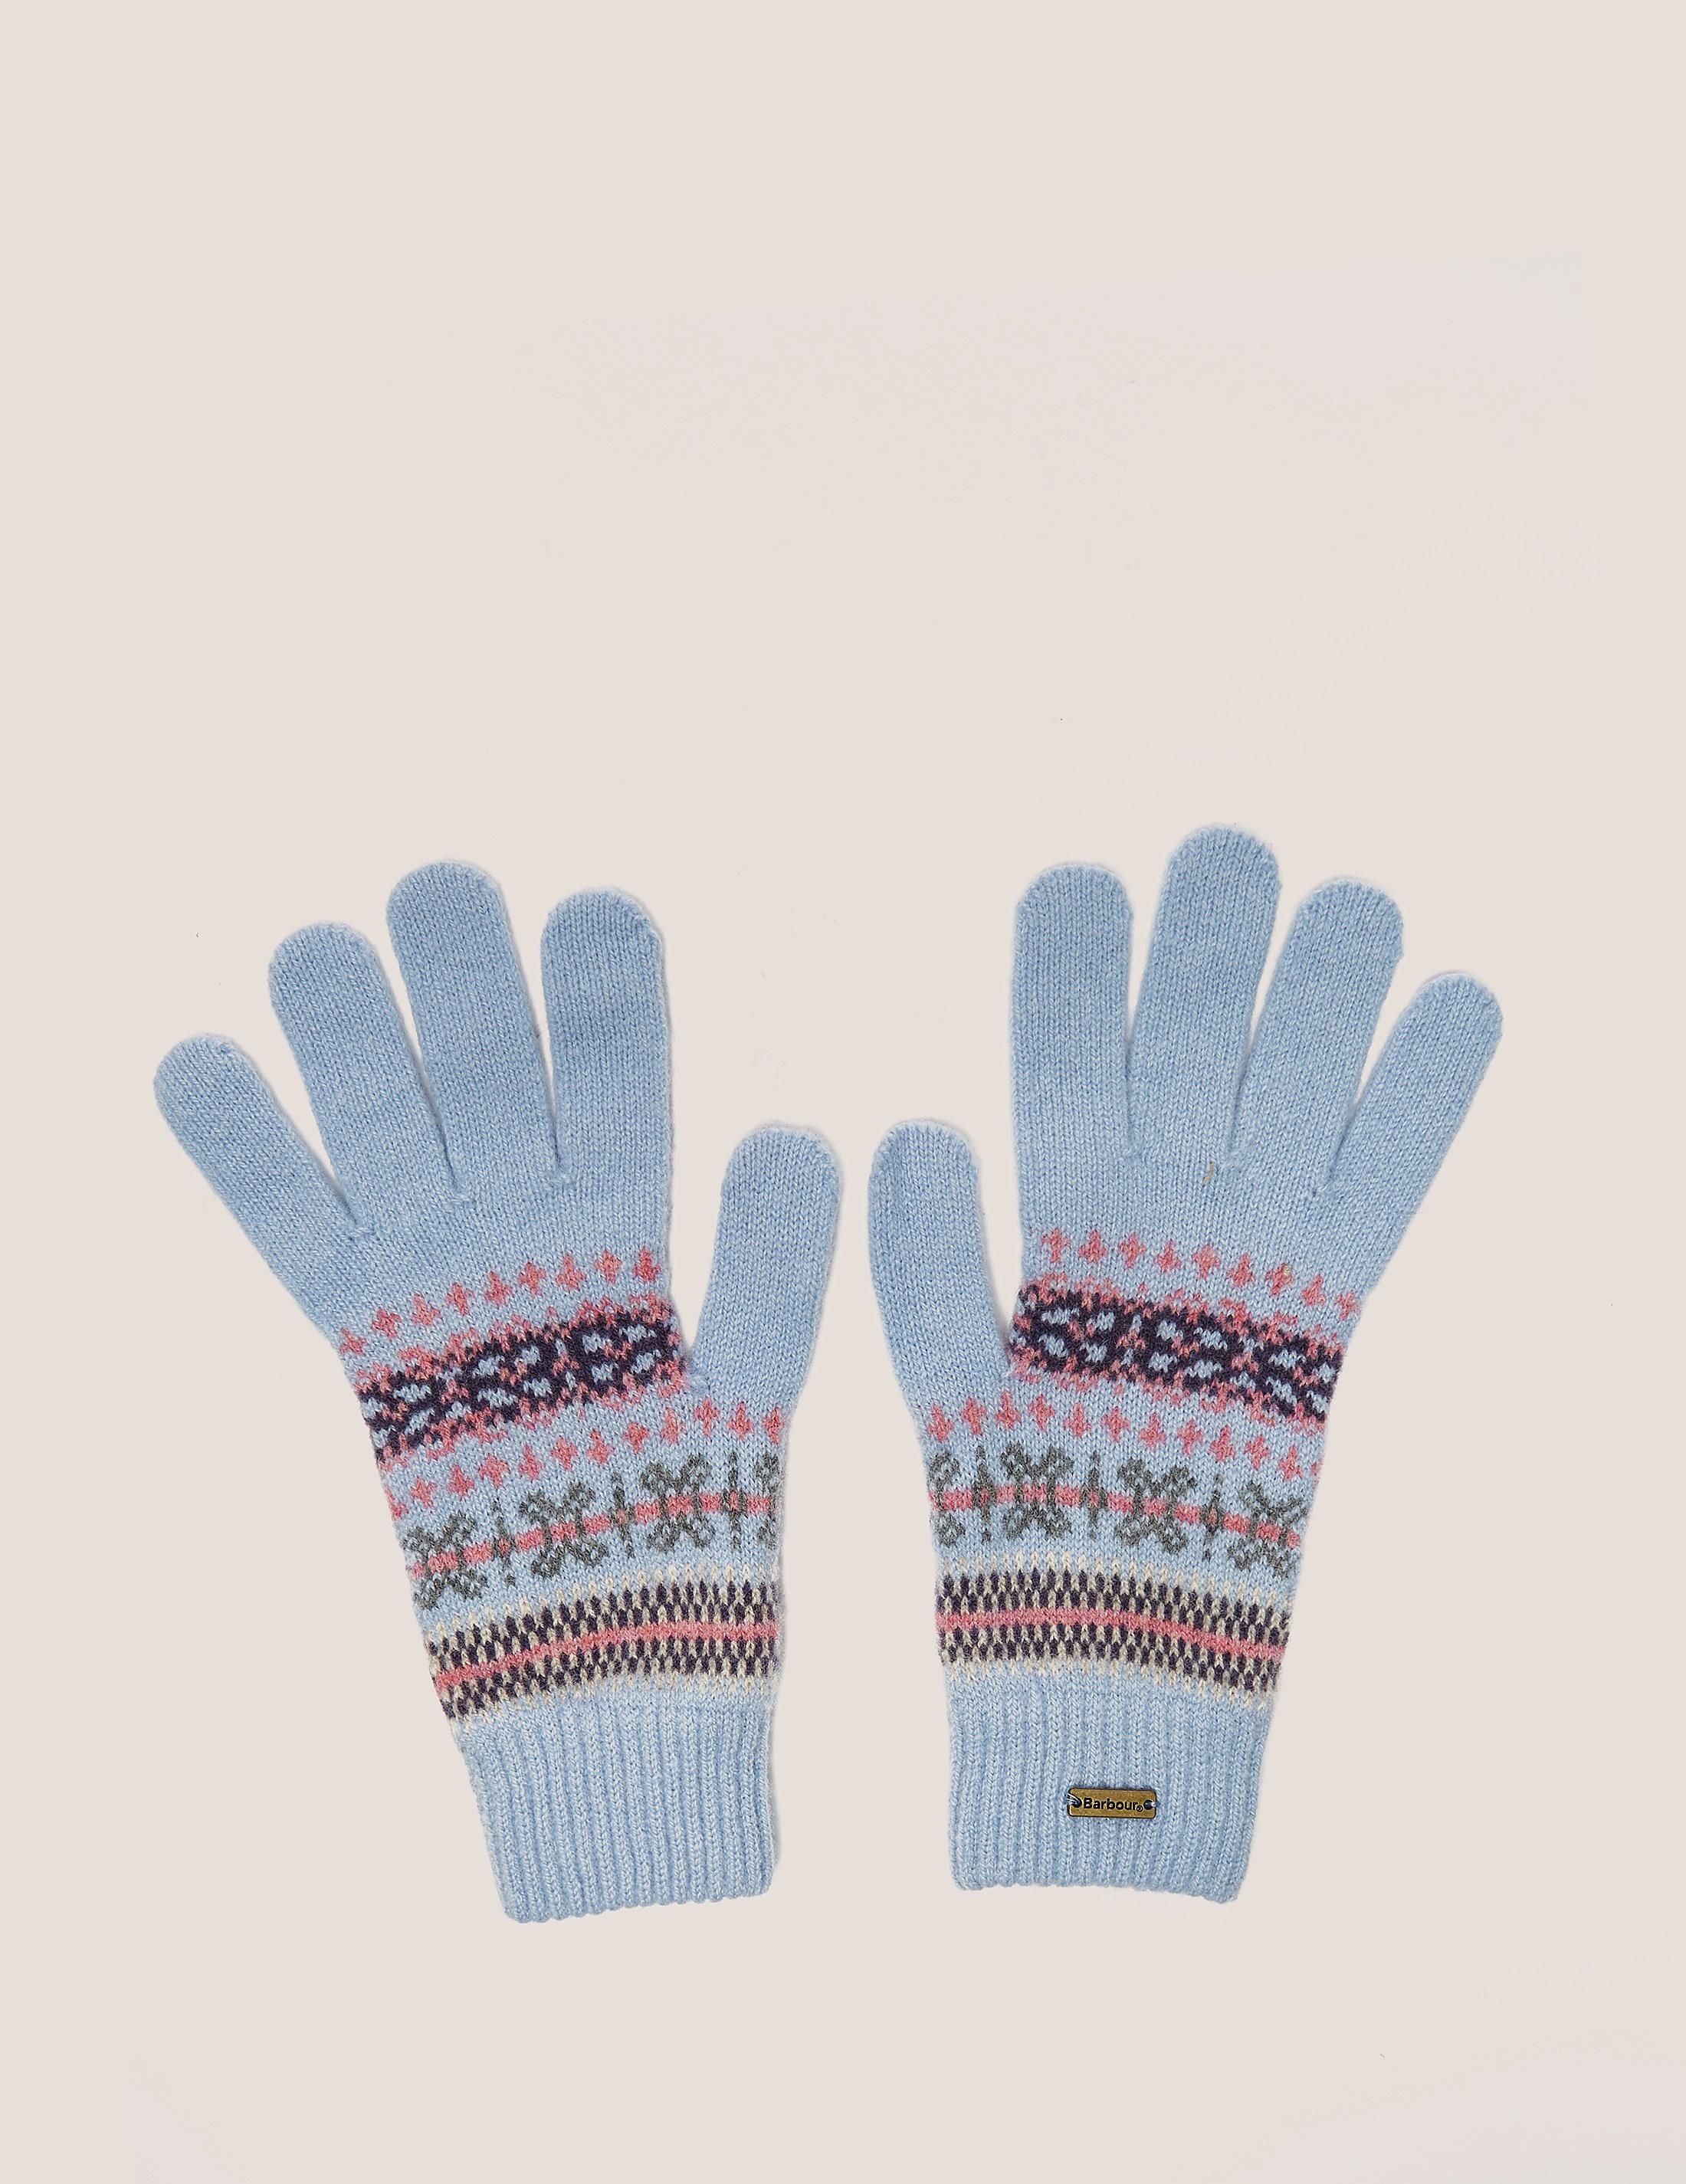 Barbour Country Fairis Gloves